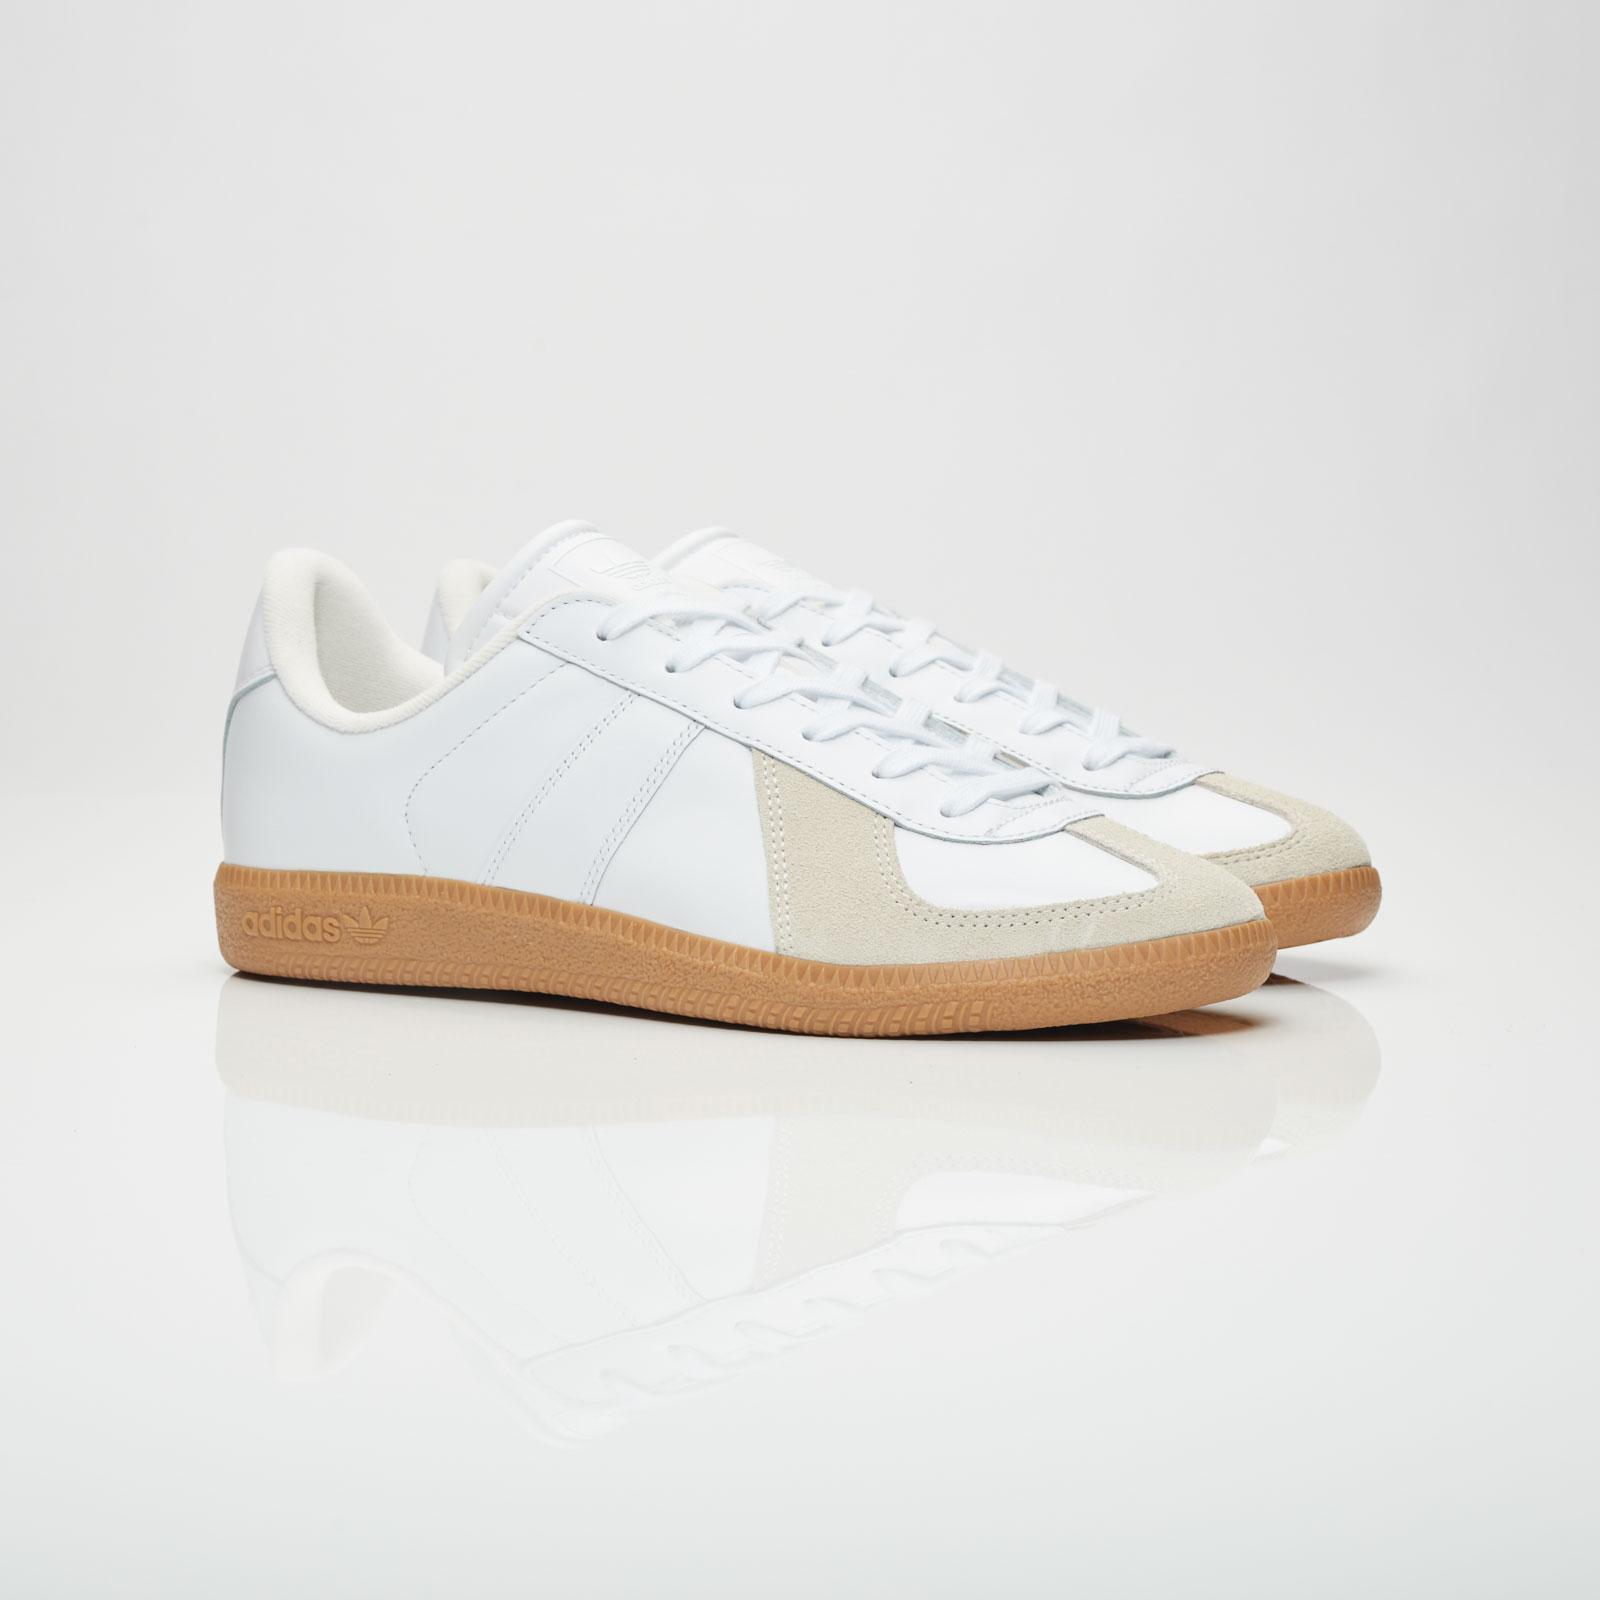 bee6442b583206 adidas BW Army - Bz0579 - Sneakersnstuff